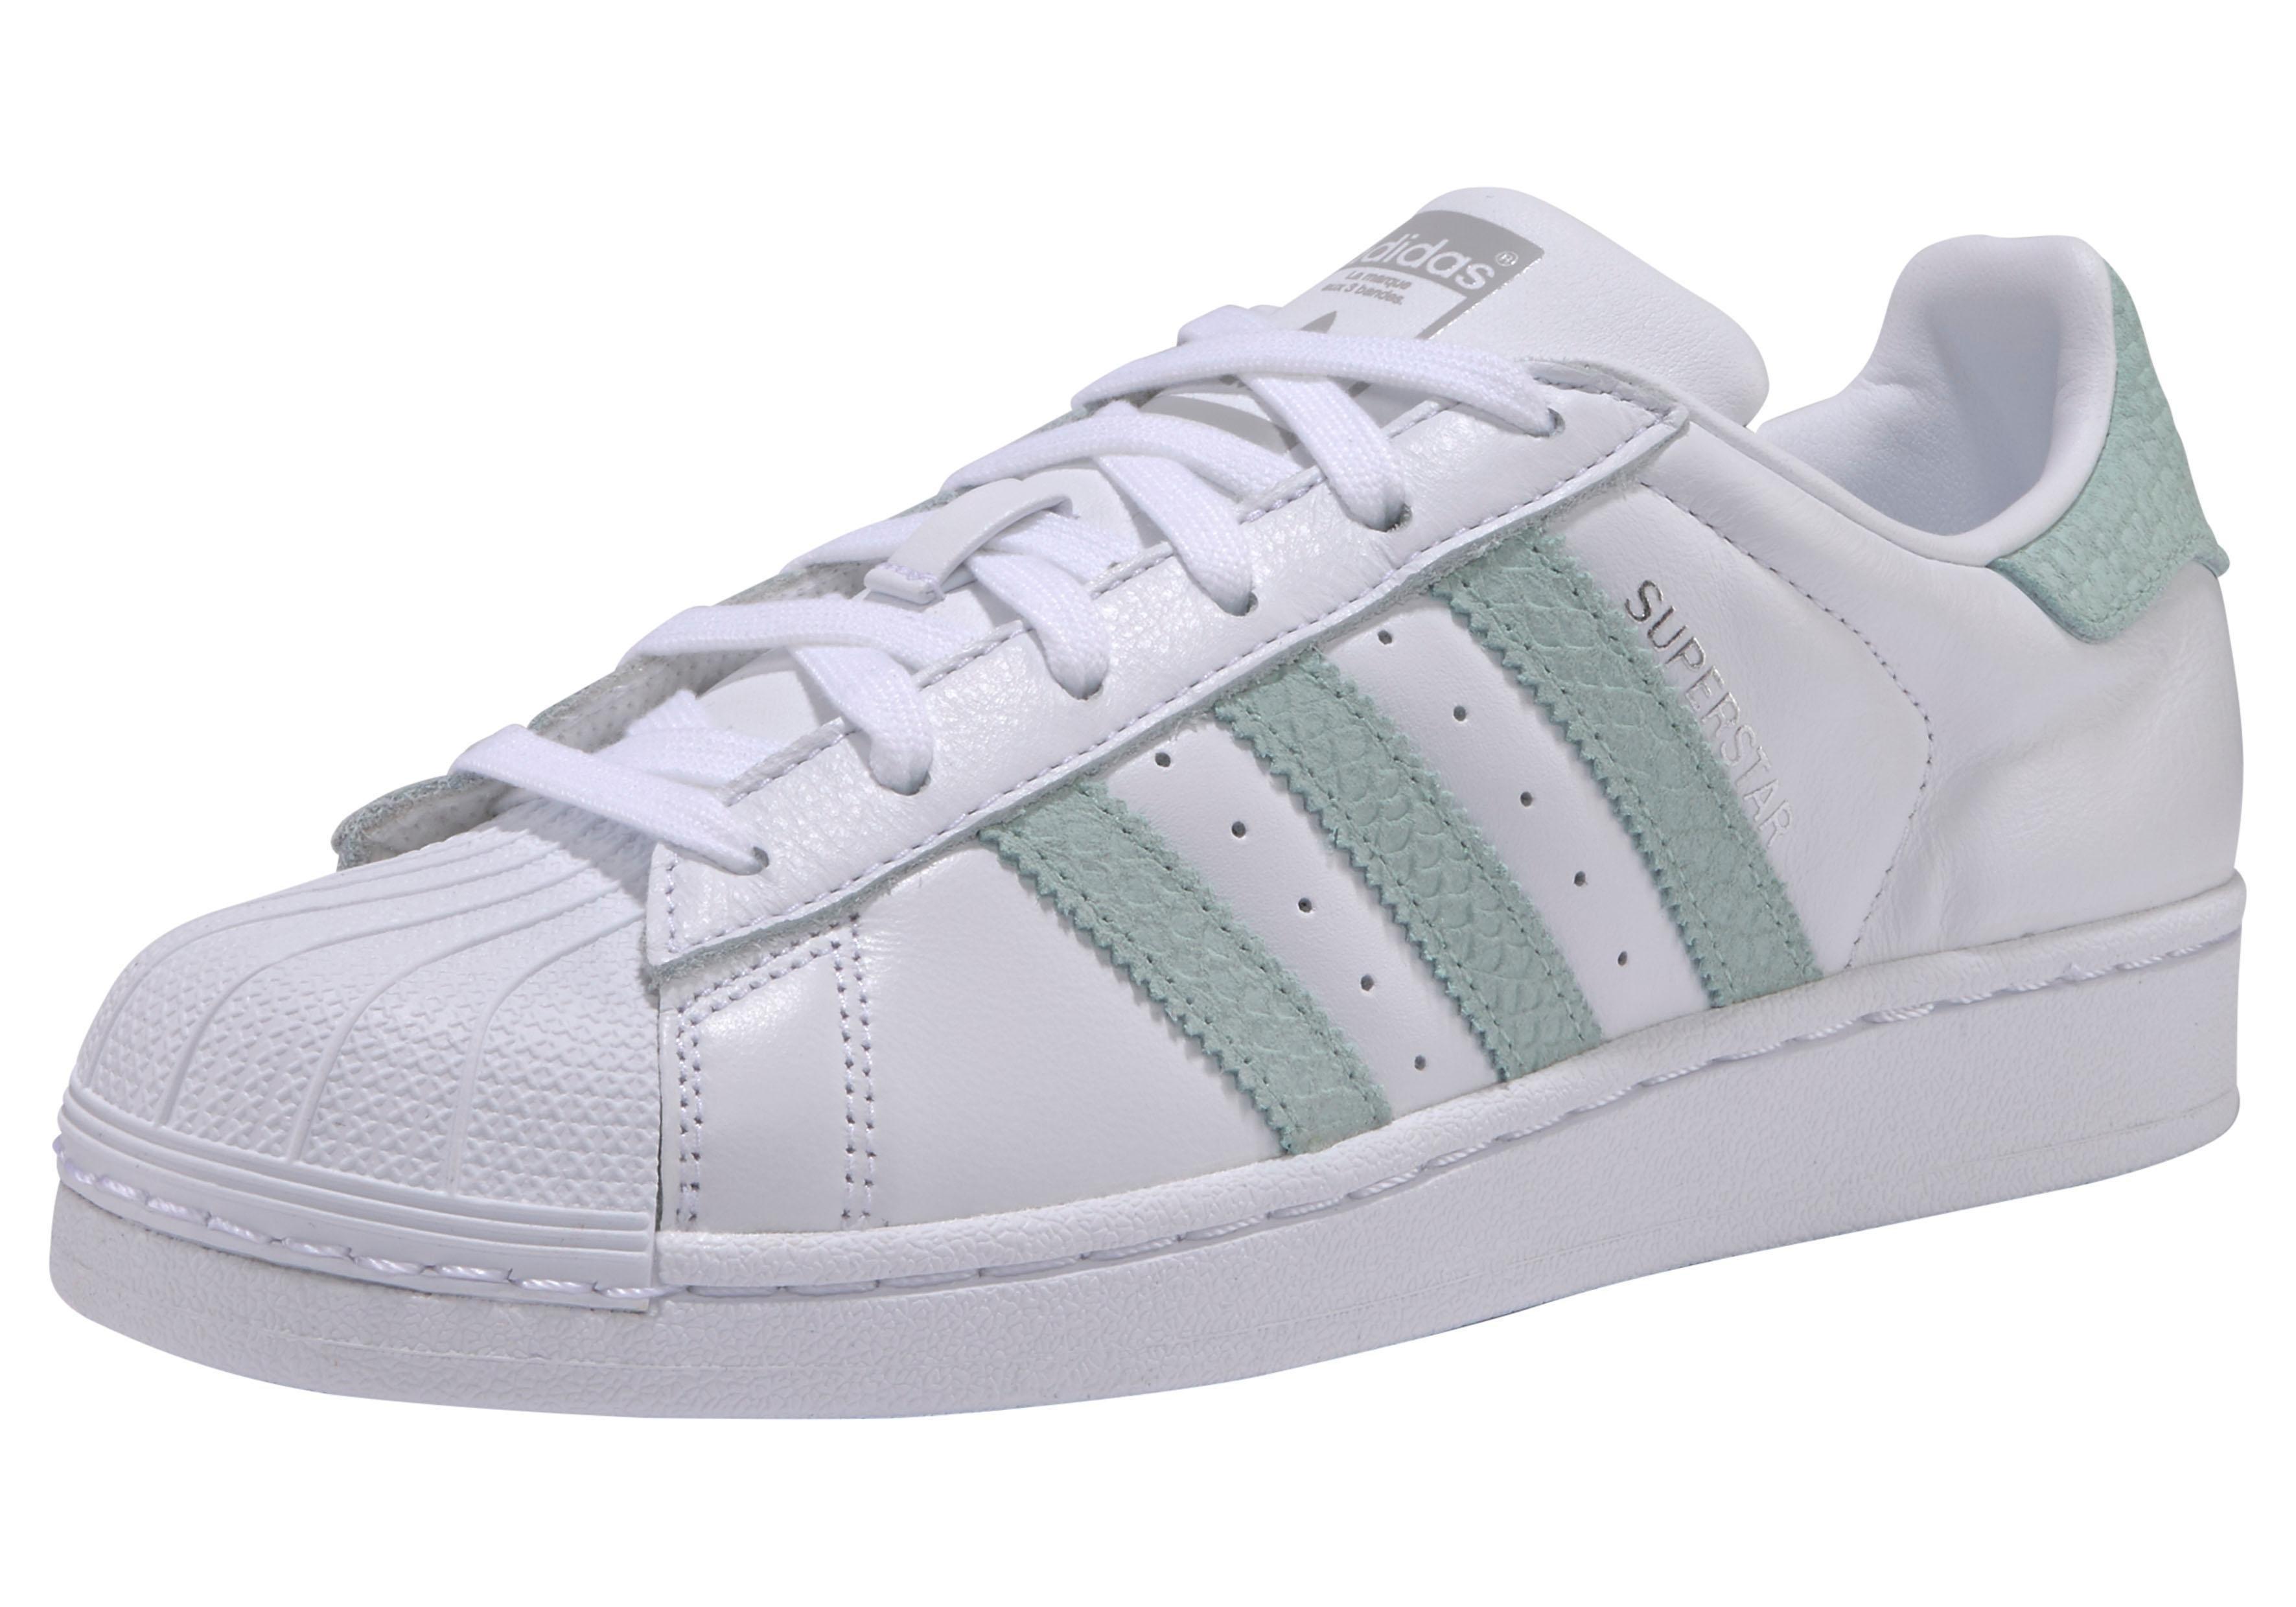 af822342b7f ... adidas Originals sneakers »Superstar W 1«, adidas Originals sneakers »Superstar  W 1«, adidas Originals sneakers »Superstar W 1«